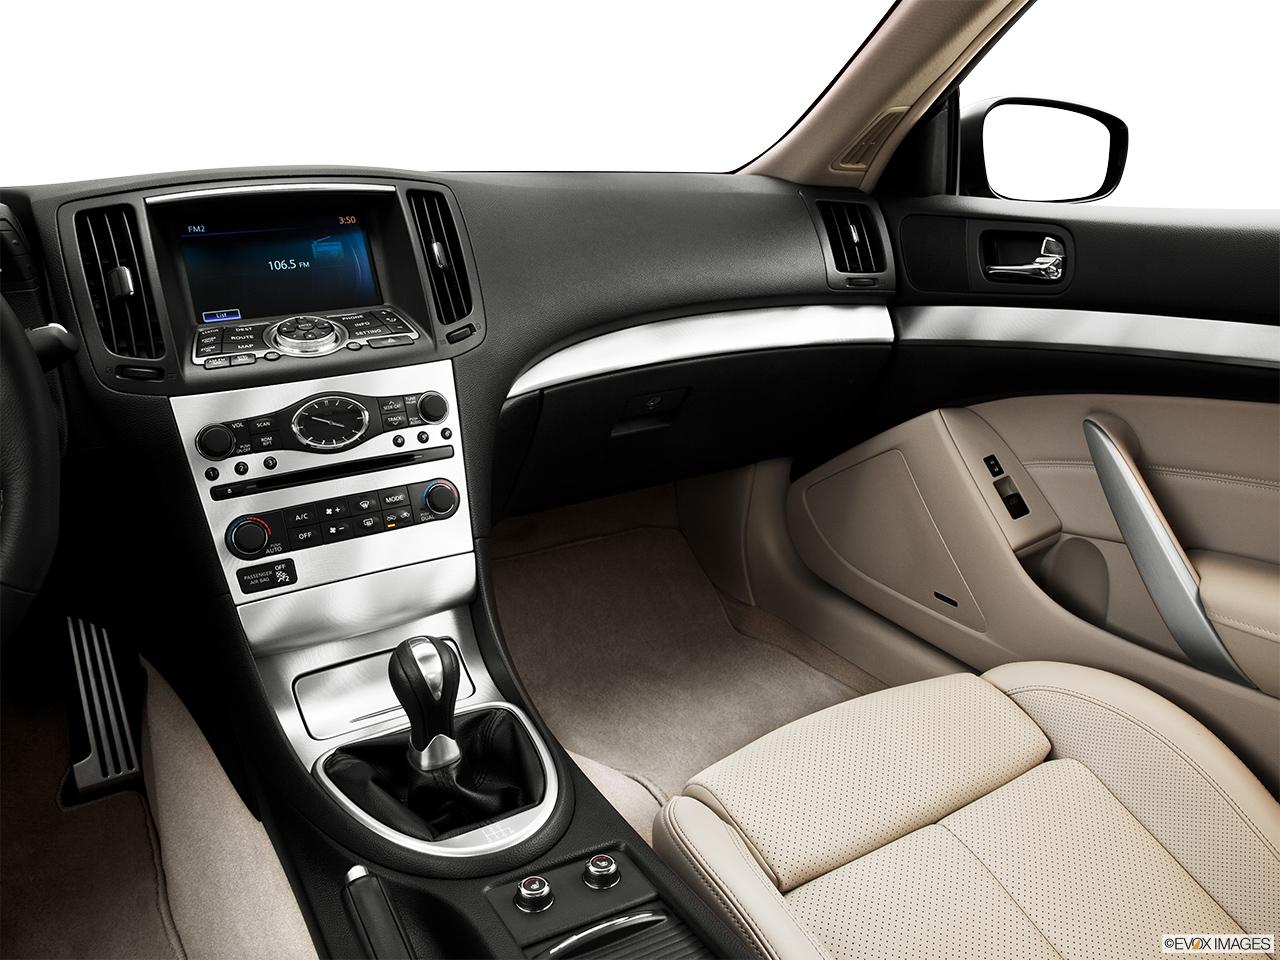 hight resolution of 2013 infiniti g37 coupe 2 door ipl rwd center console passenger side